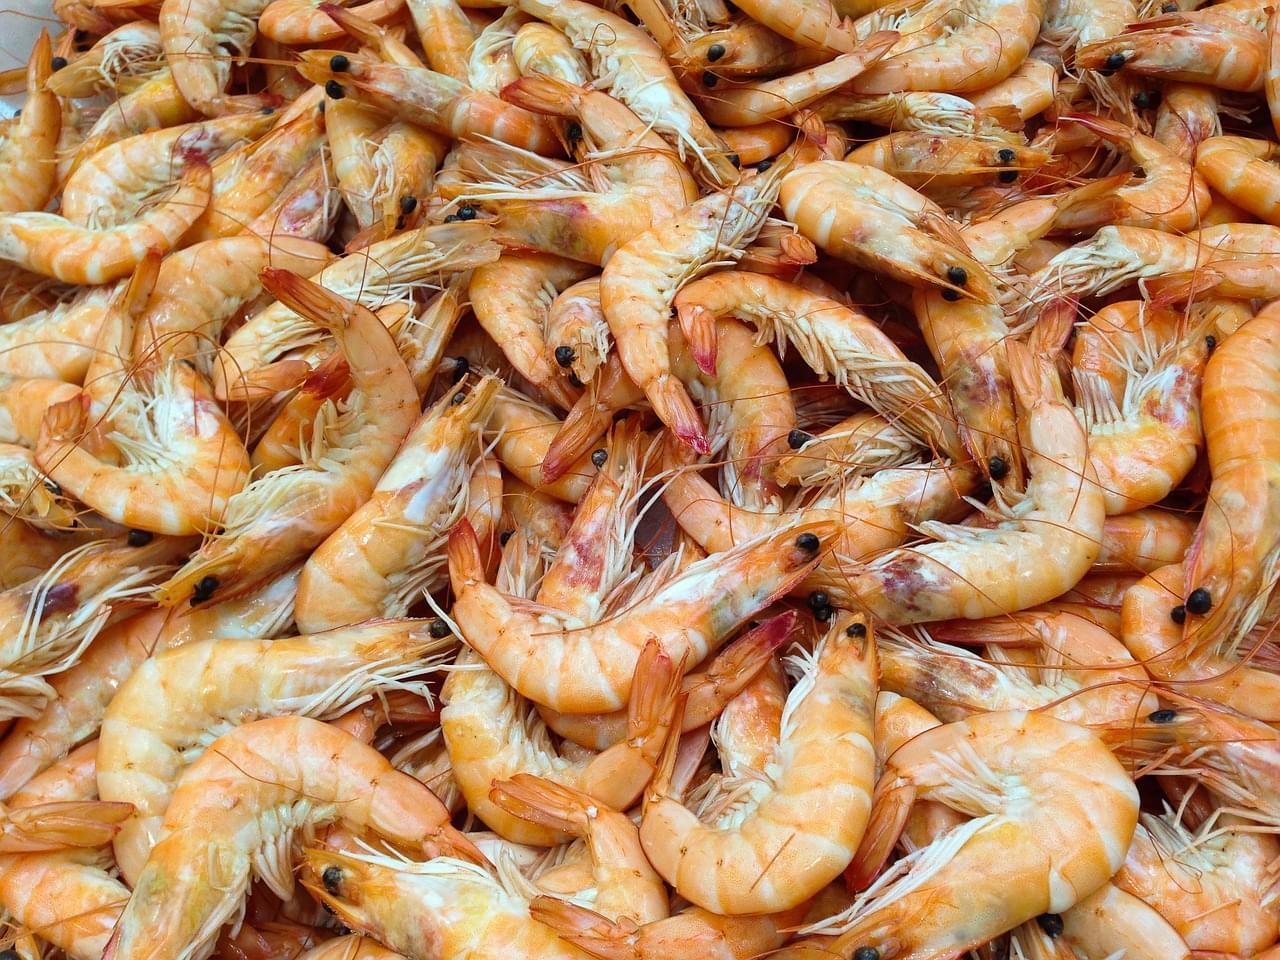 2020 Delcambre Shrimp Festival Canceled